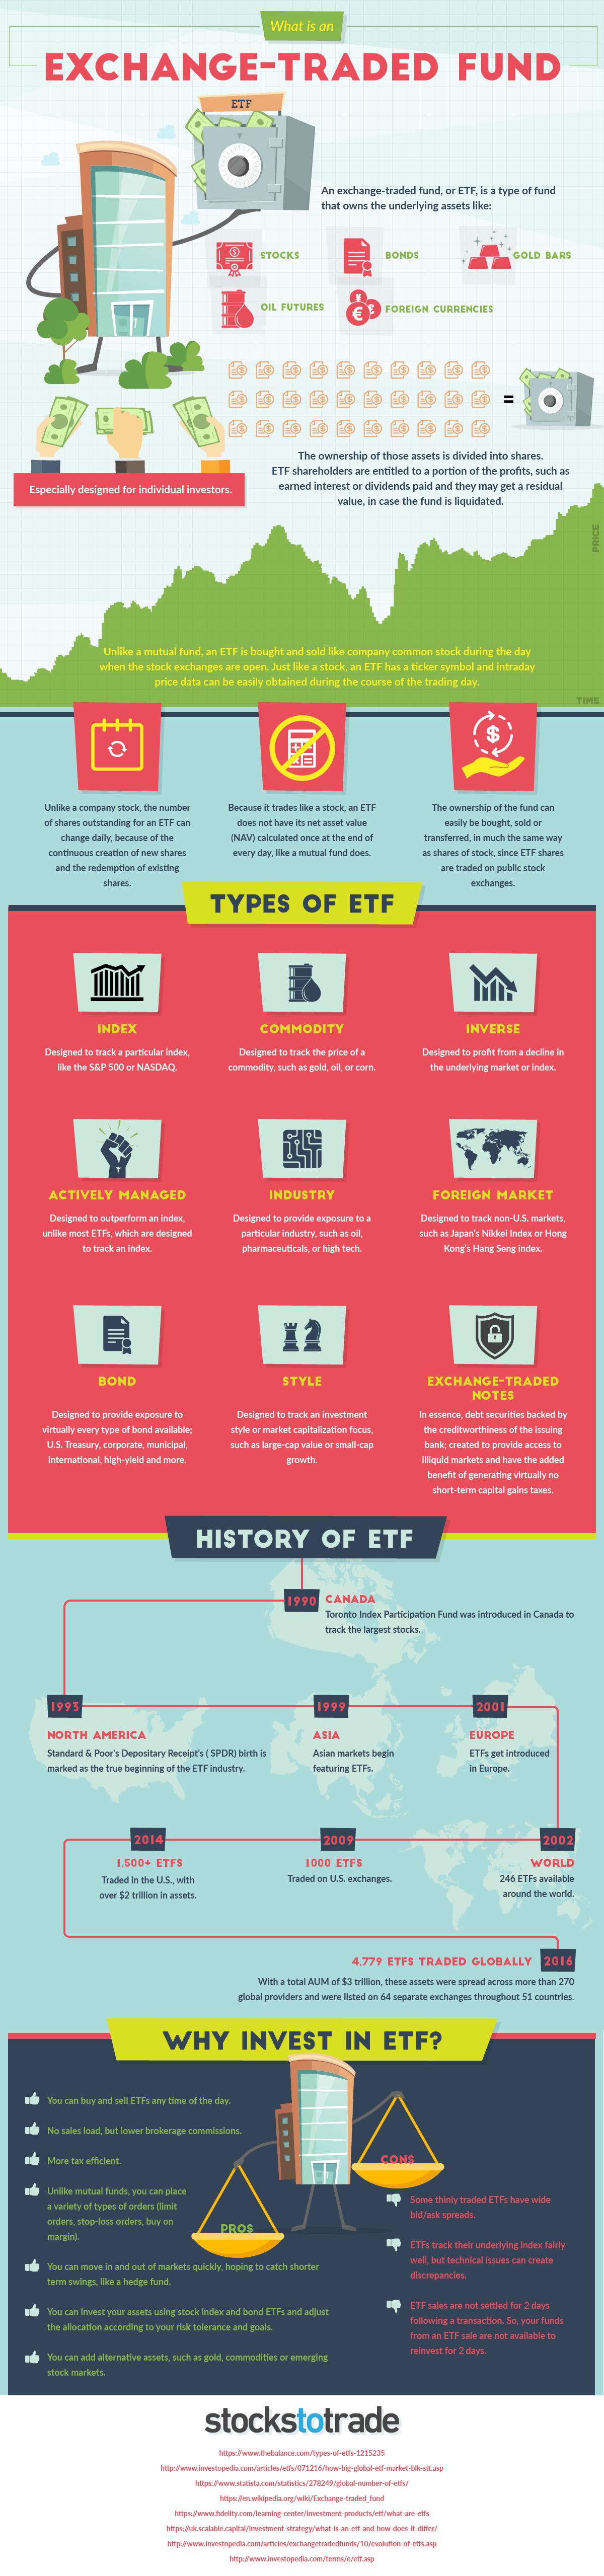 ETF nicheetfs.com